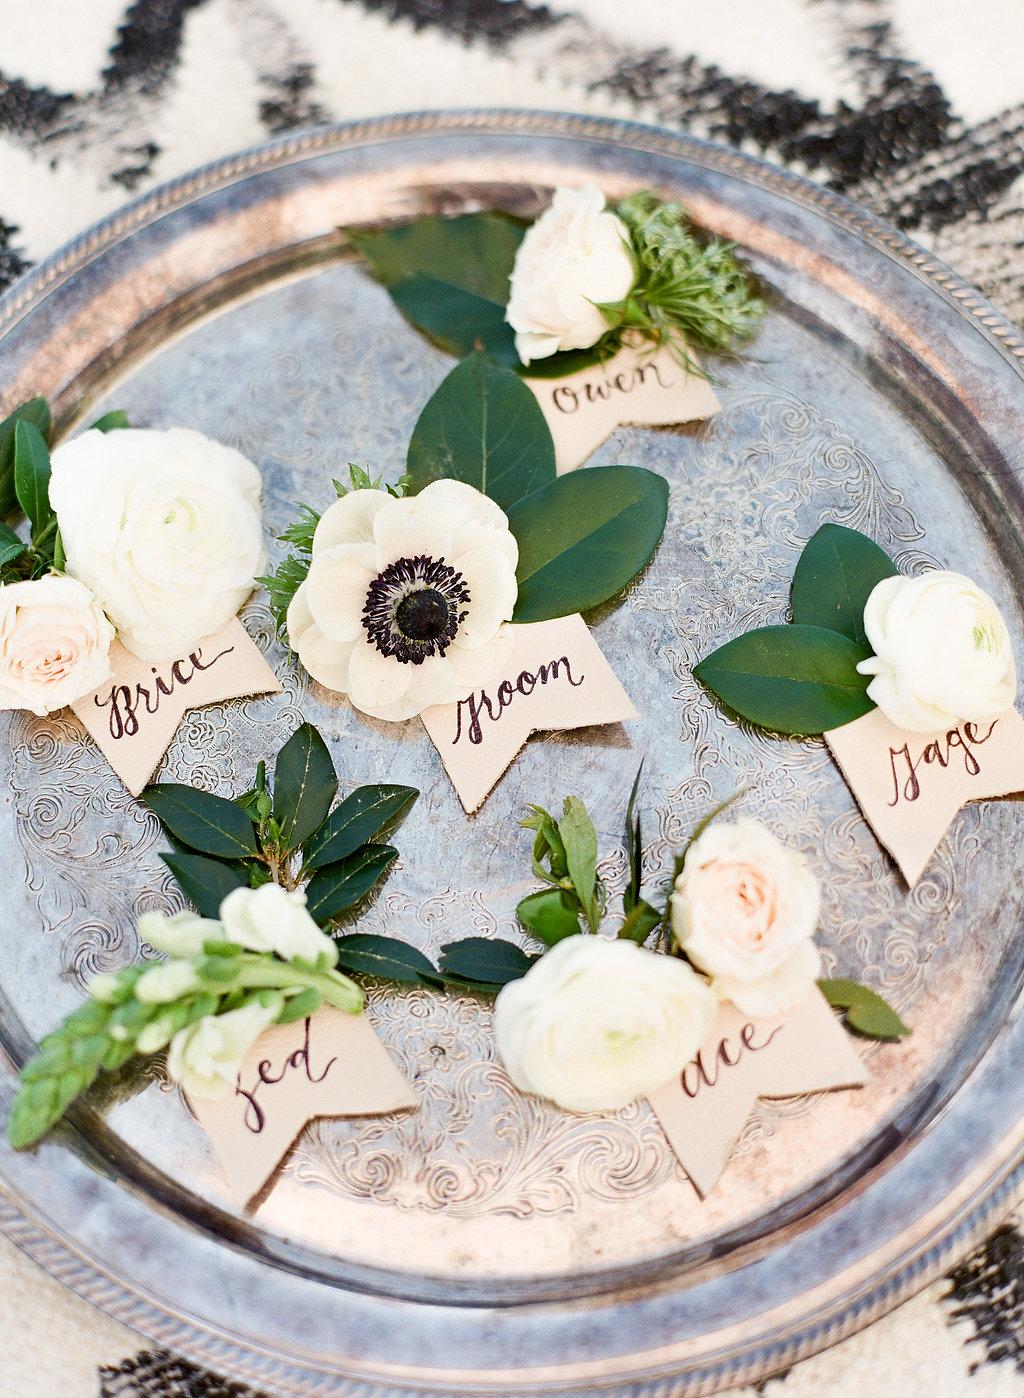 the-wyld-dock-bar-wedding-ivory-and-beau-savannah-wedding-planner-savannah-event-designer-savannah-wedding-florist-anemone-boutonniere-rustic-outdoor-wedding-inspiration-calligraphy-savannah-georgia-bridal-boutique.jpg